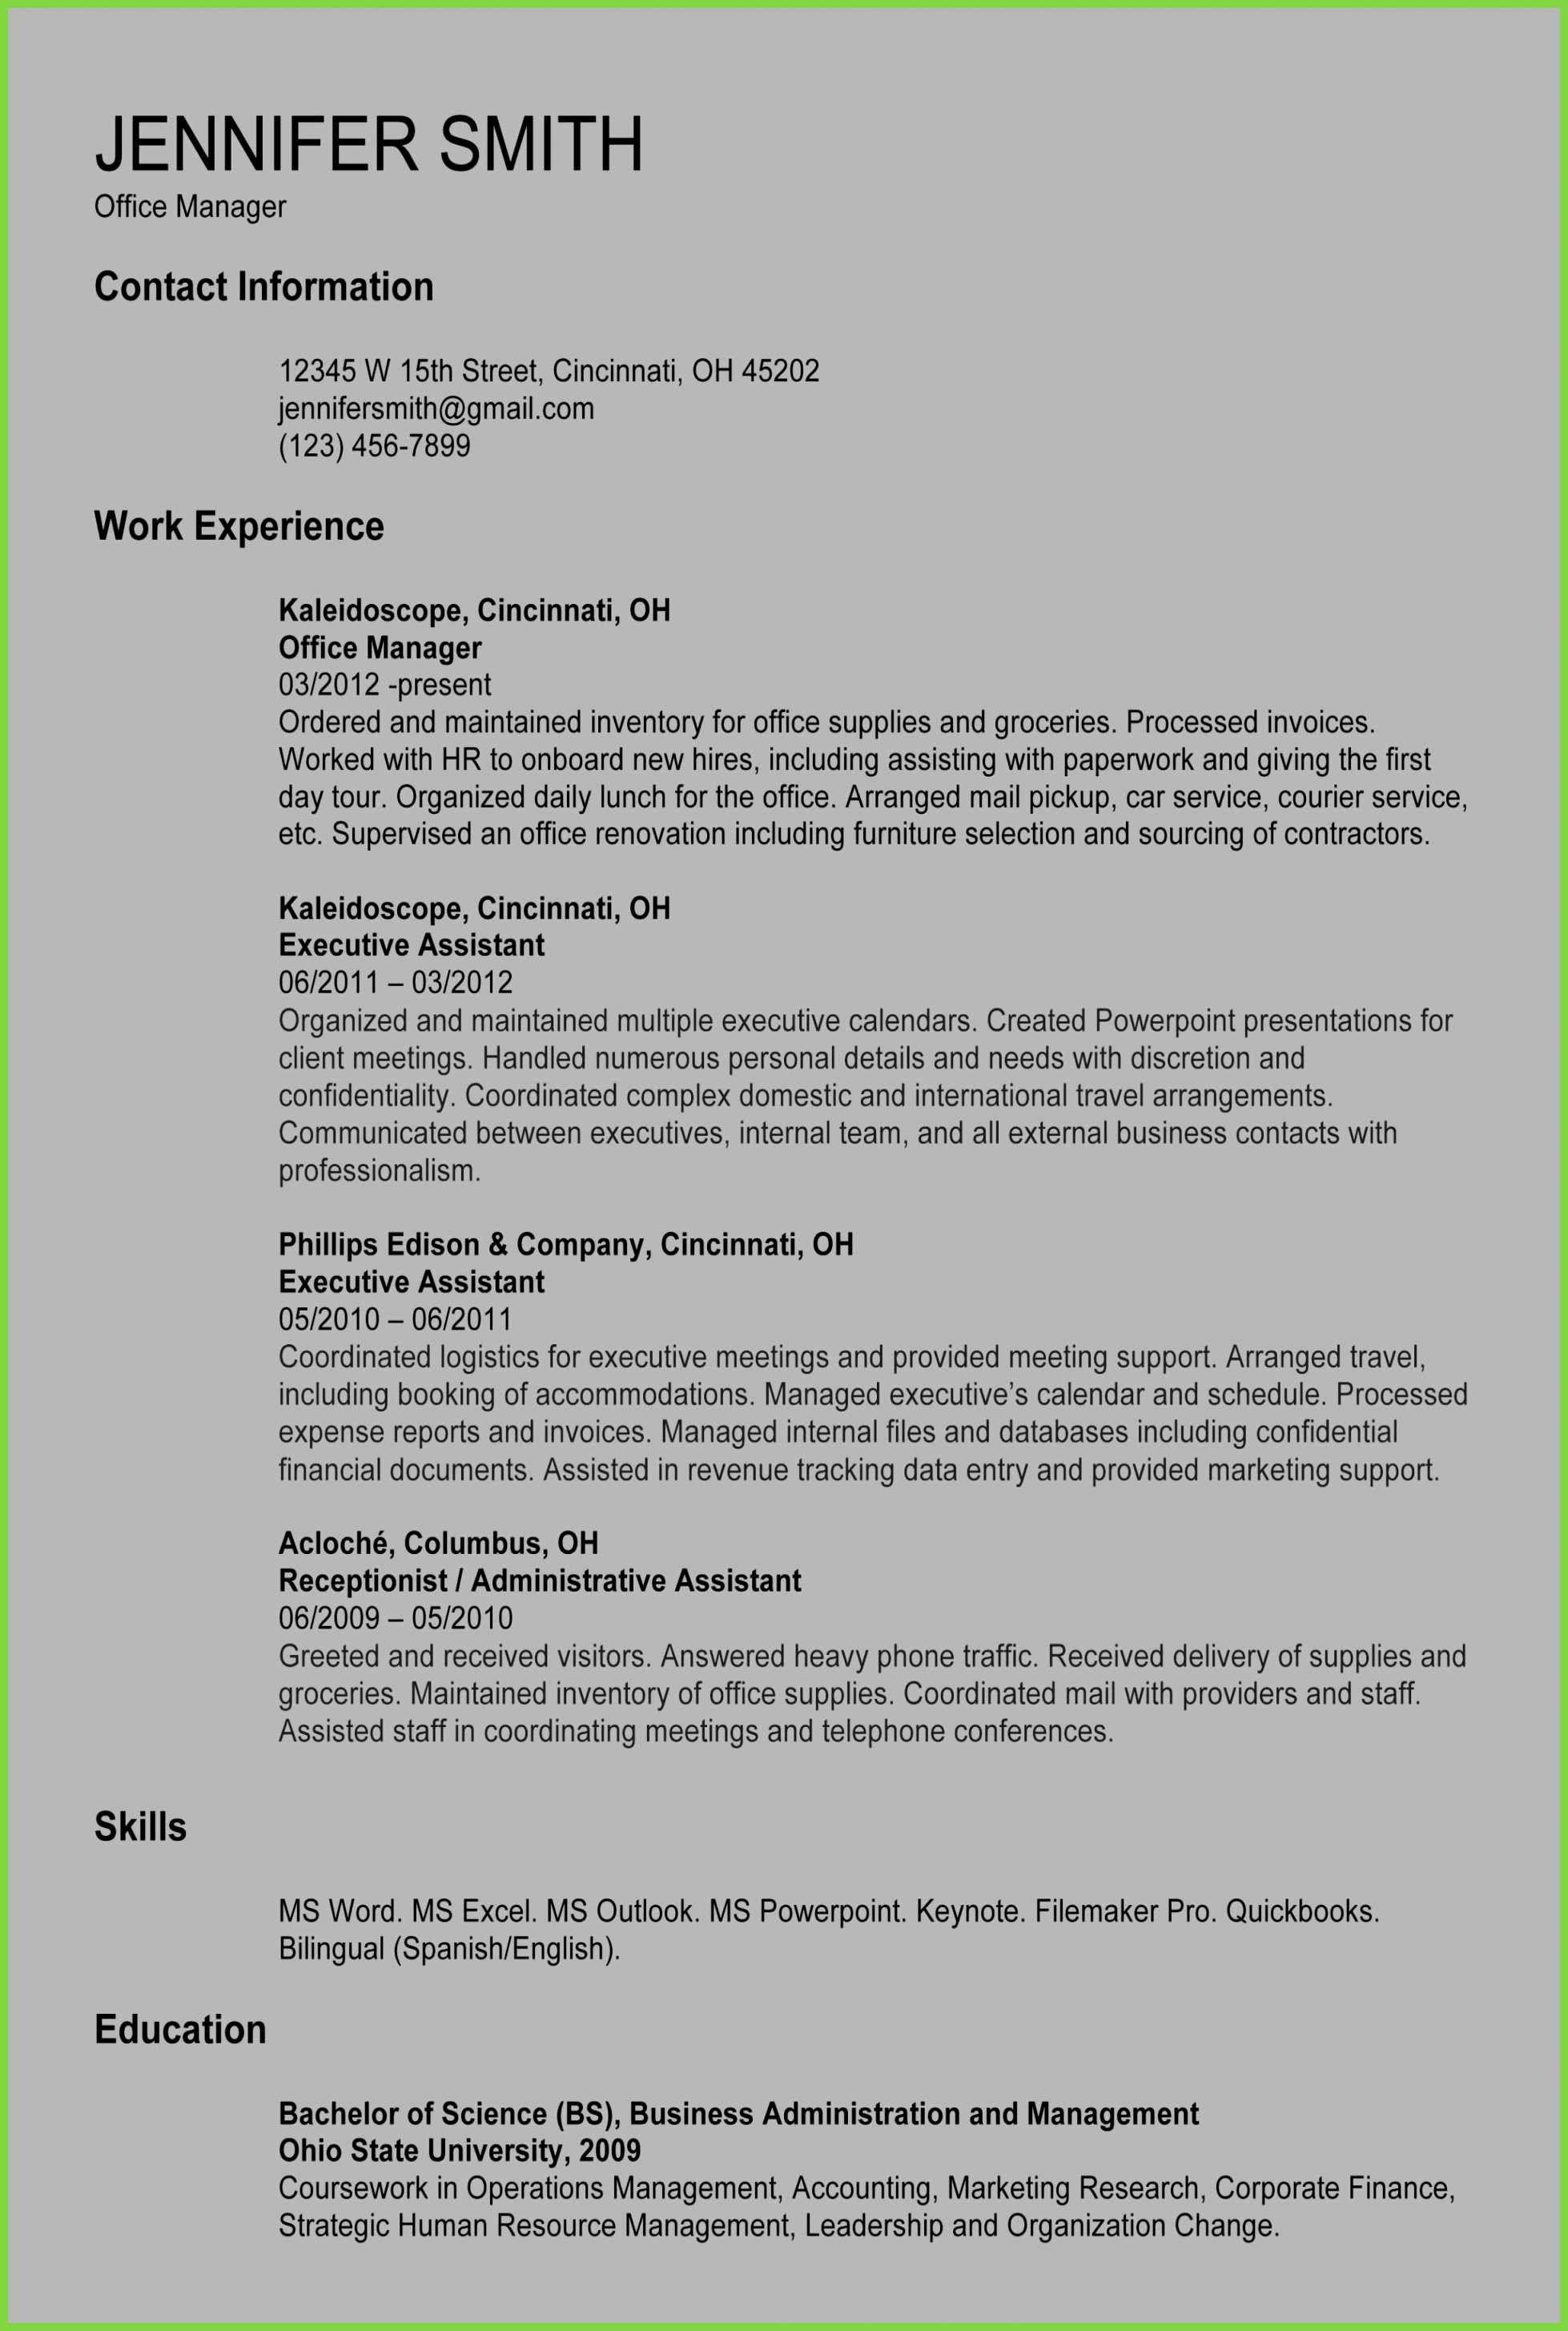 Business Development Director Resume Beautiful Elegant Sample Human R Free Business Card Templates Business Card Template Psd Free Professional Resume Template